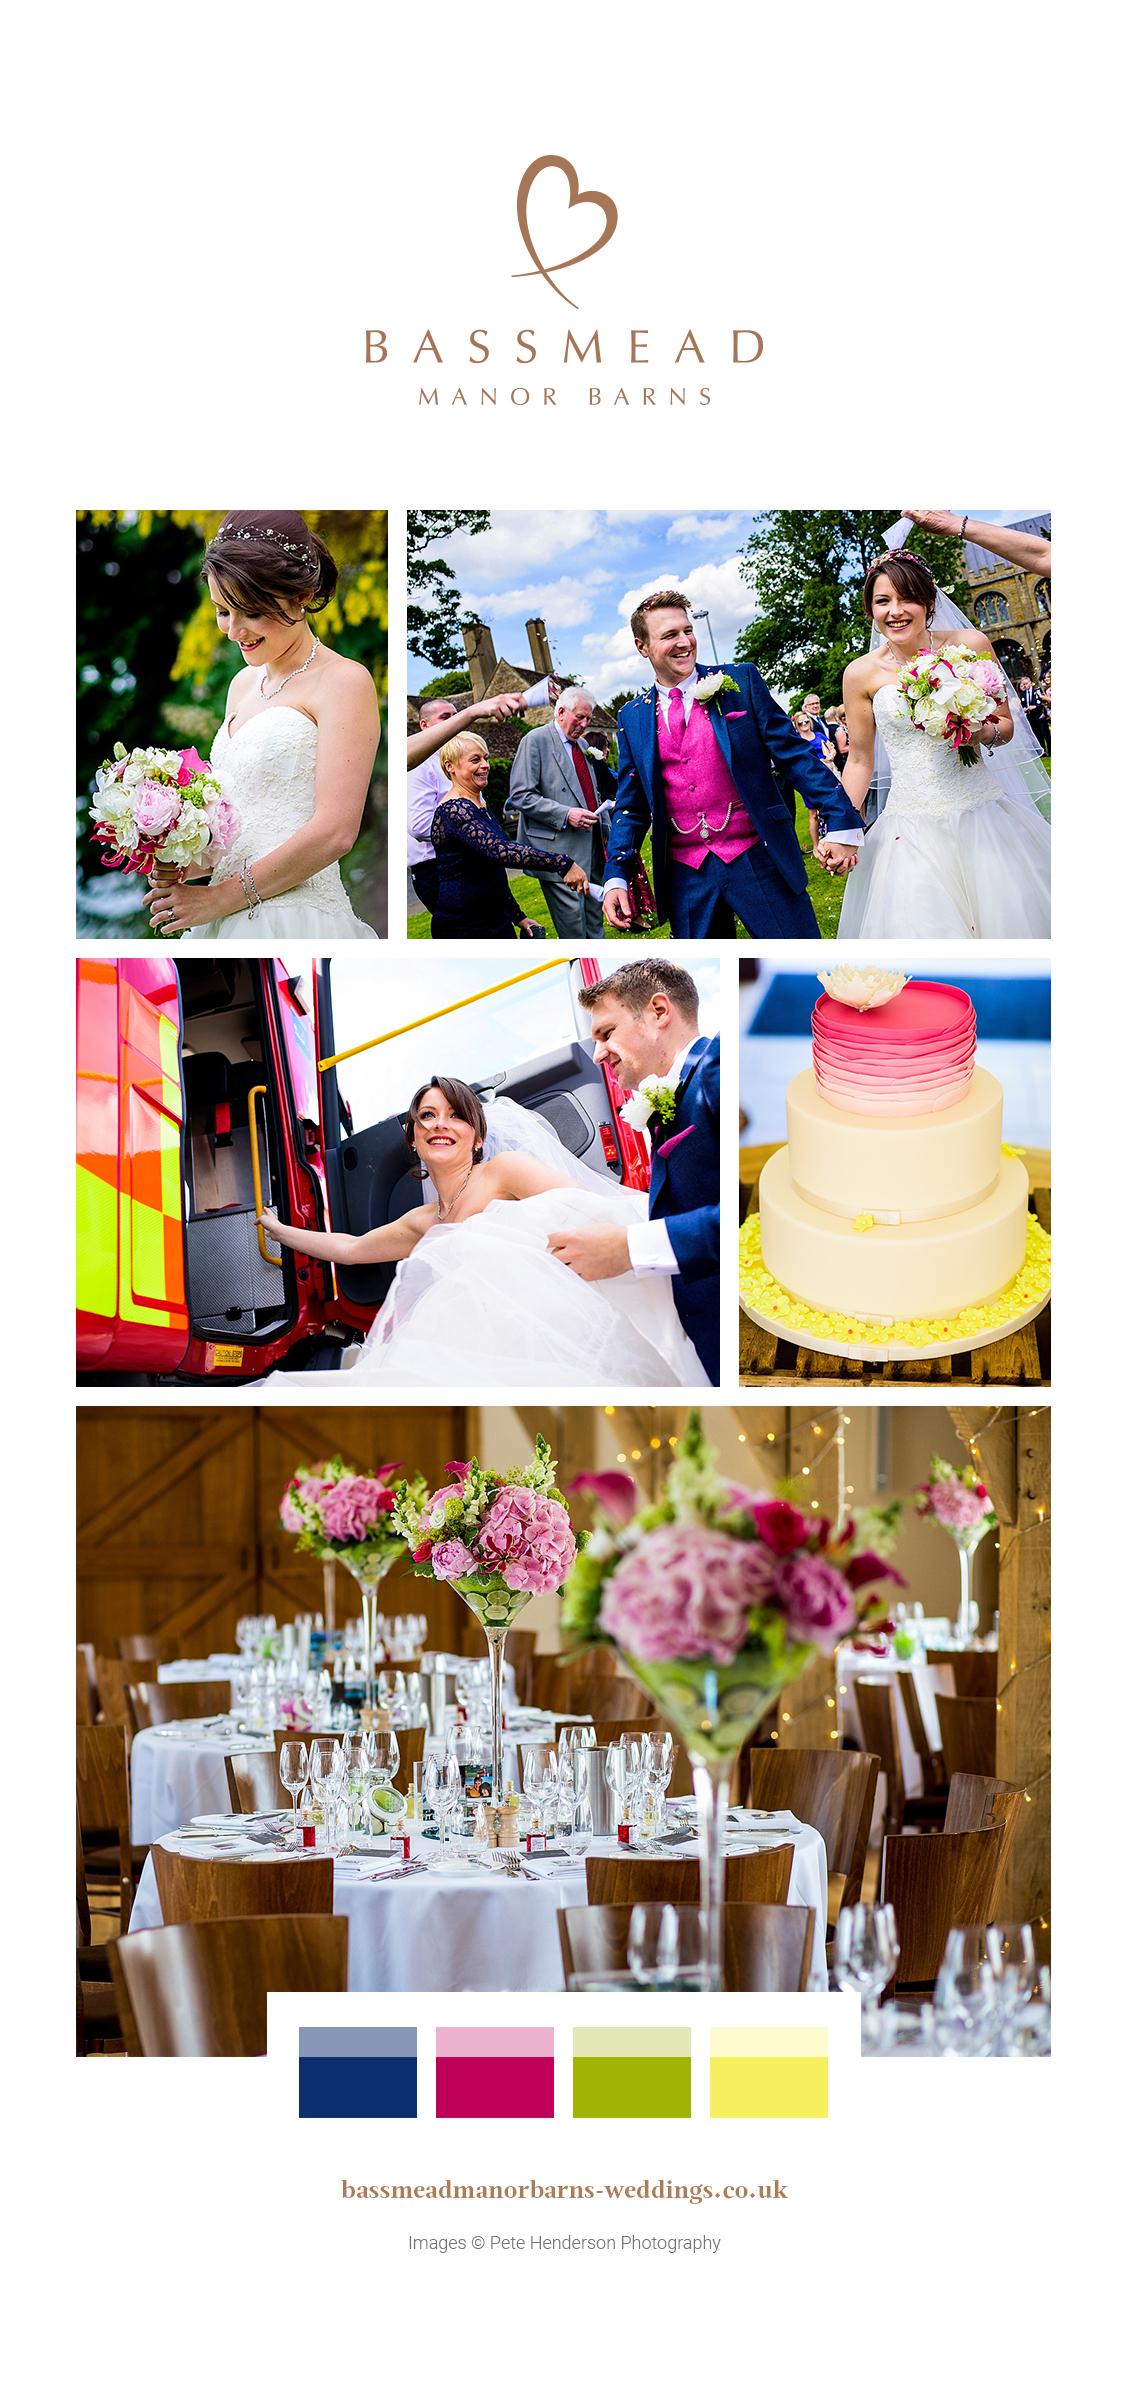 Carly and Stuart's real life wedding at Bassmead Manor Barns